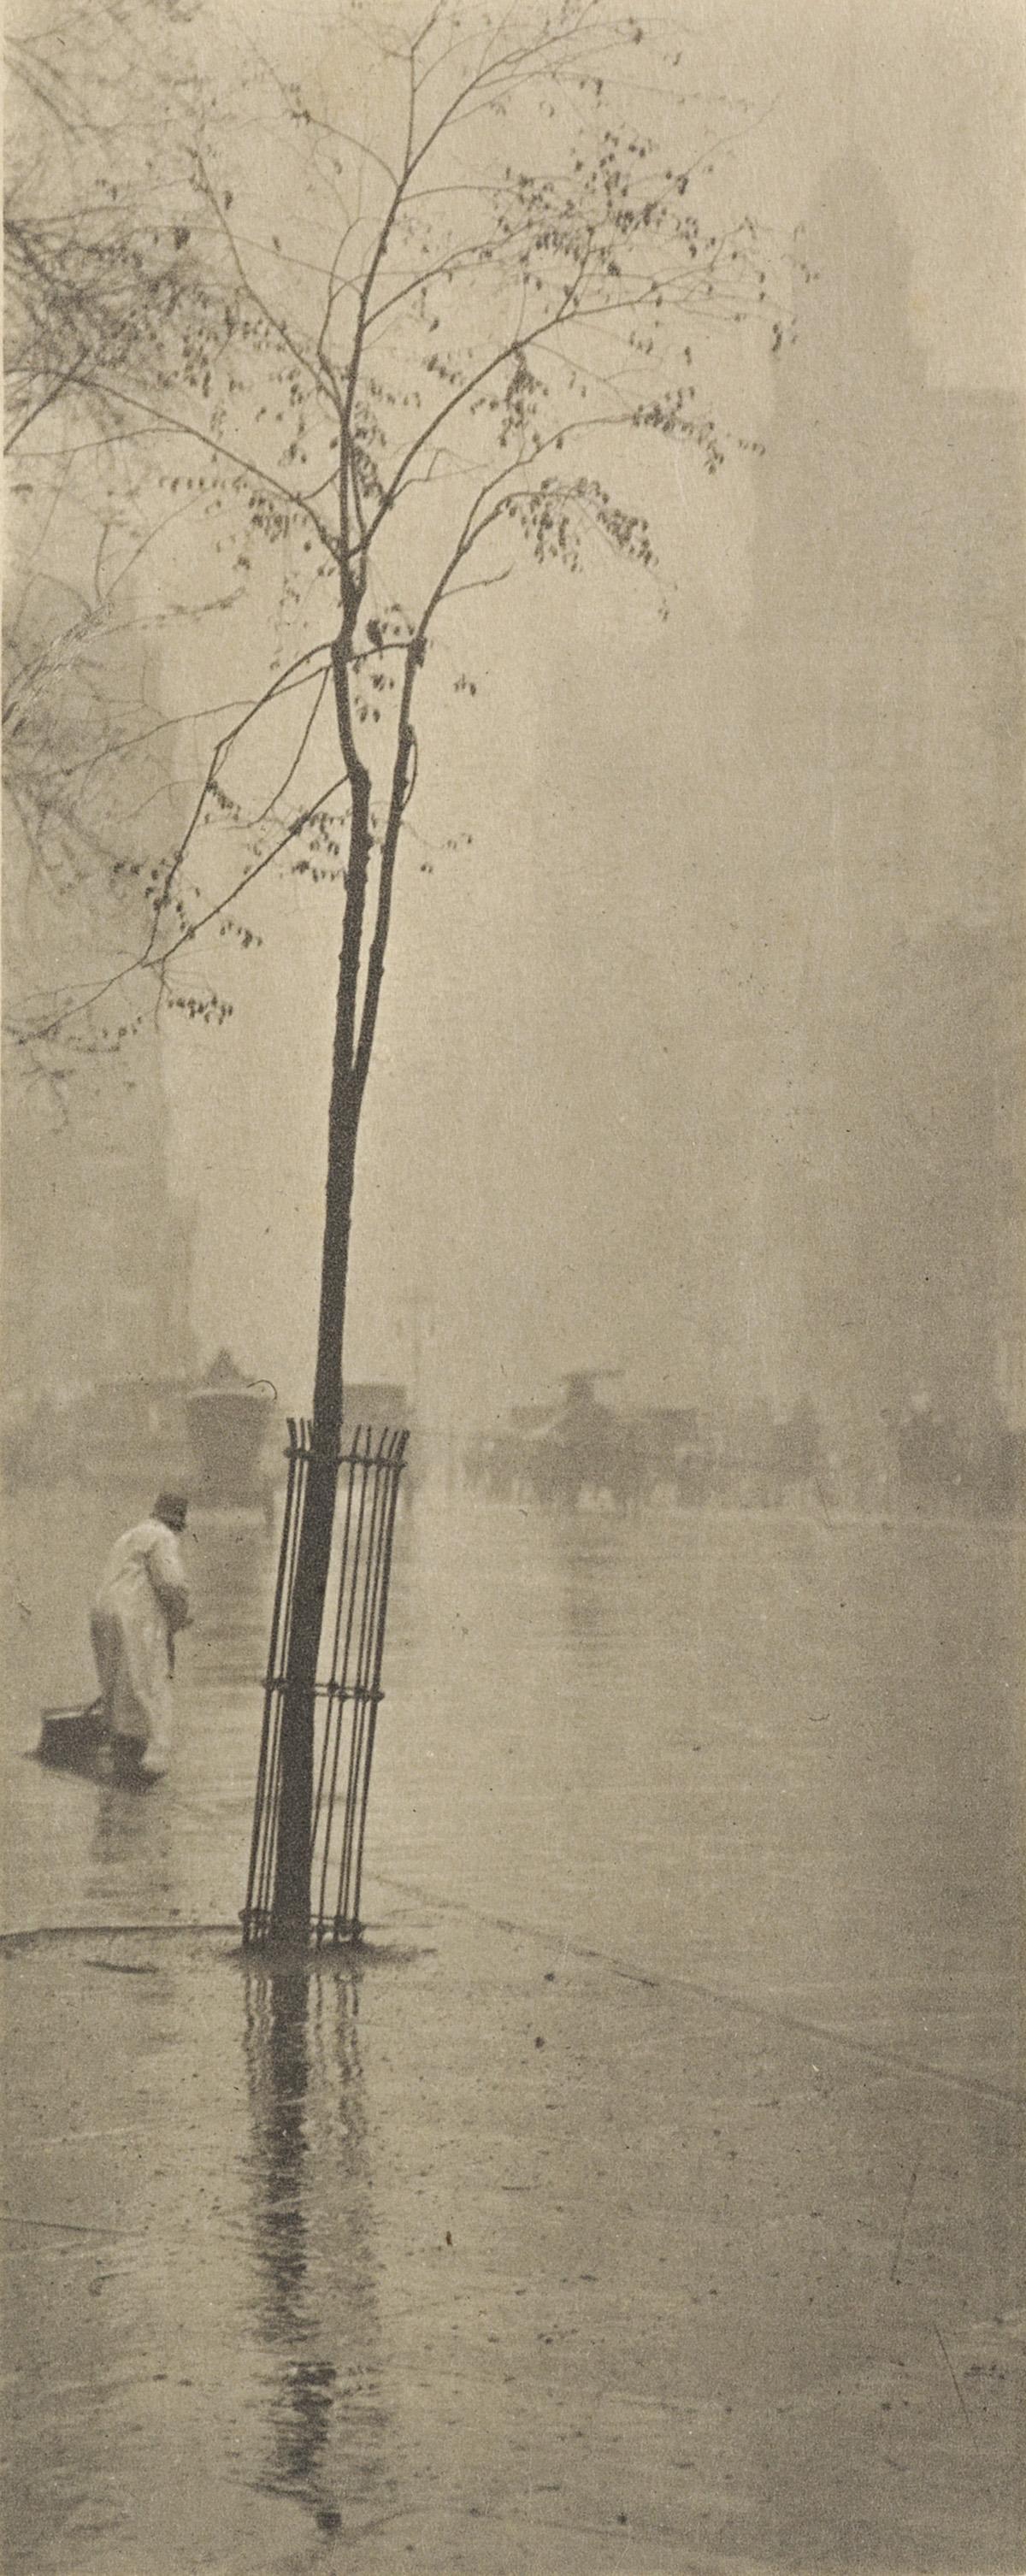 ALFRED-STIEGLITZ-(1864-1946)-Spring-Showers-from-Camera-Work